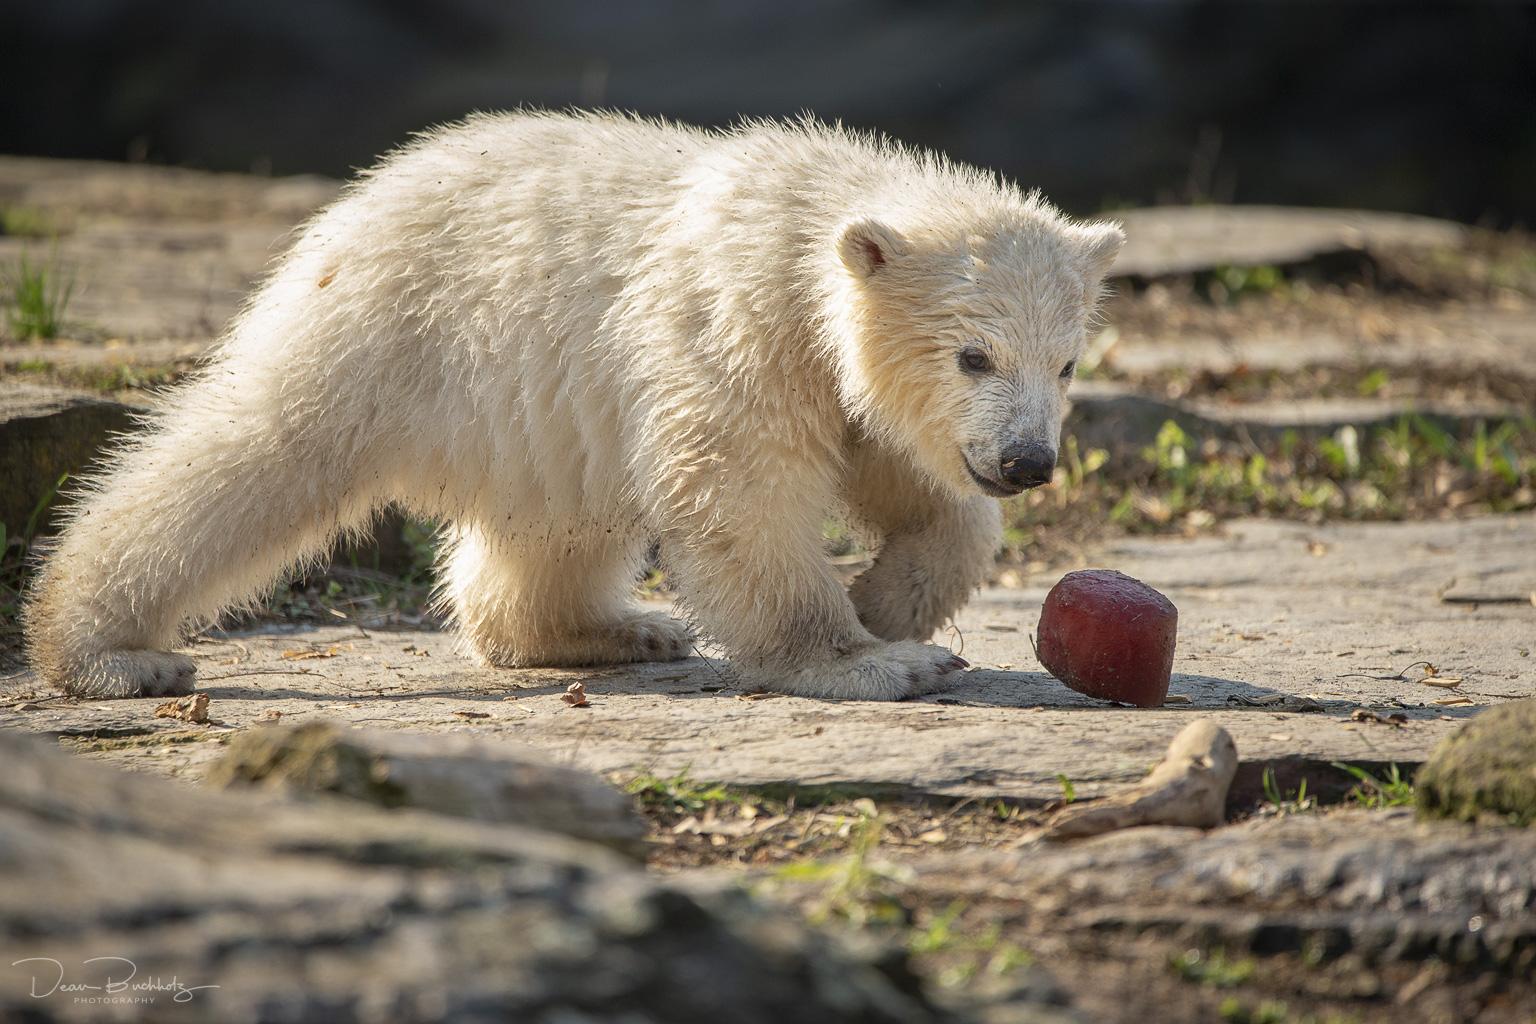 Zoo Tierpark Berlin vom 06.04.2019